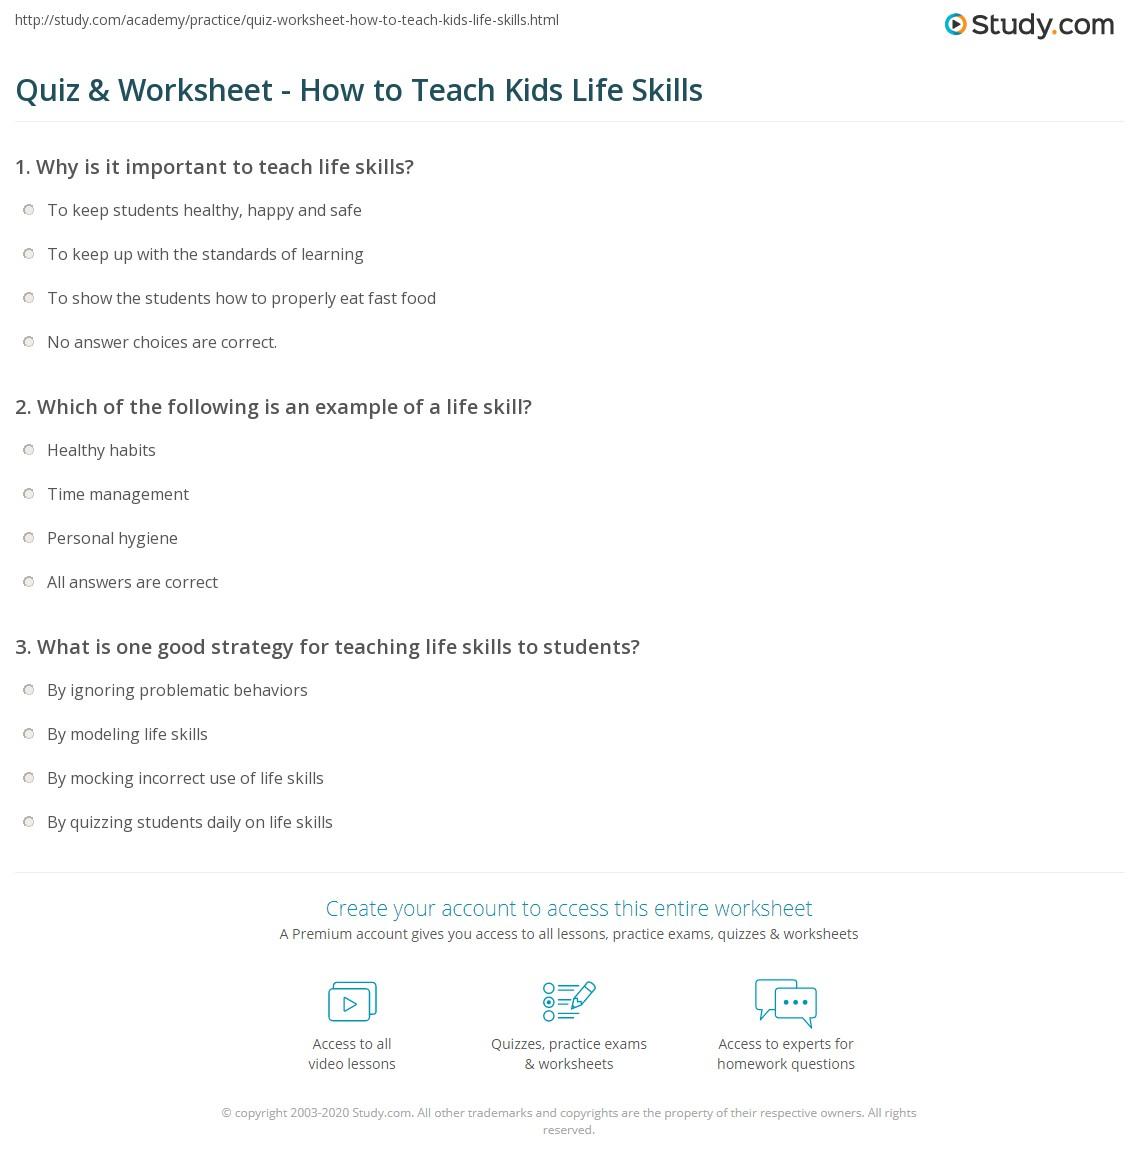 hight resolution of Quiz \u0026 Worksheet - How to Teach Kids Life Skills   Study.com